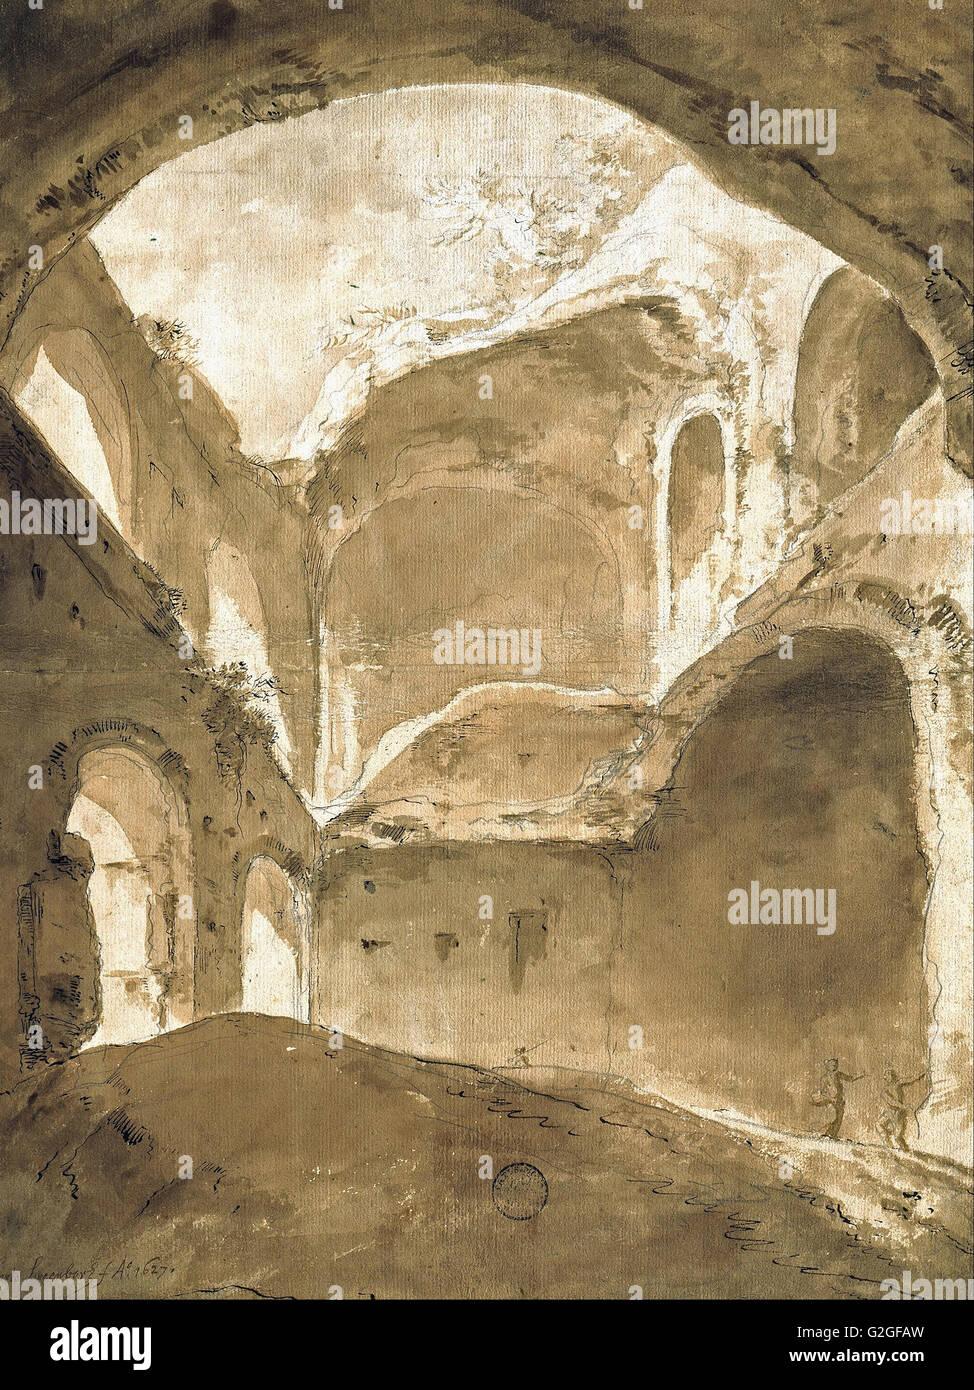 Bartholomeus Breenbergh - Interior of an Ancient Ruin - Museum Kunstpalast, Düsseldorf - Stock Image